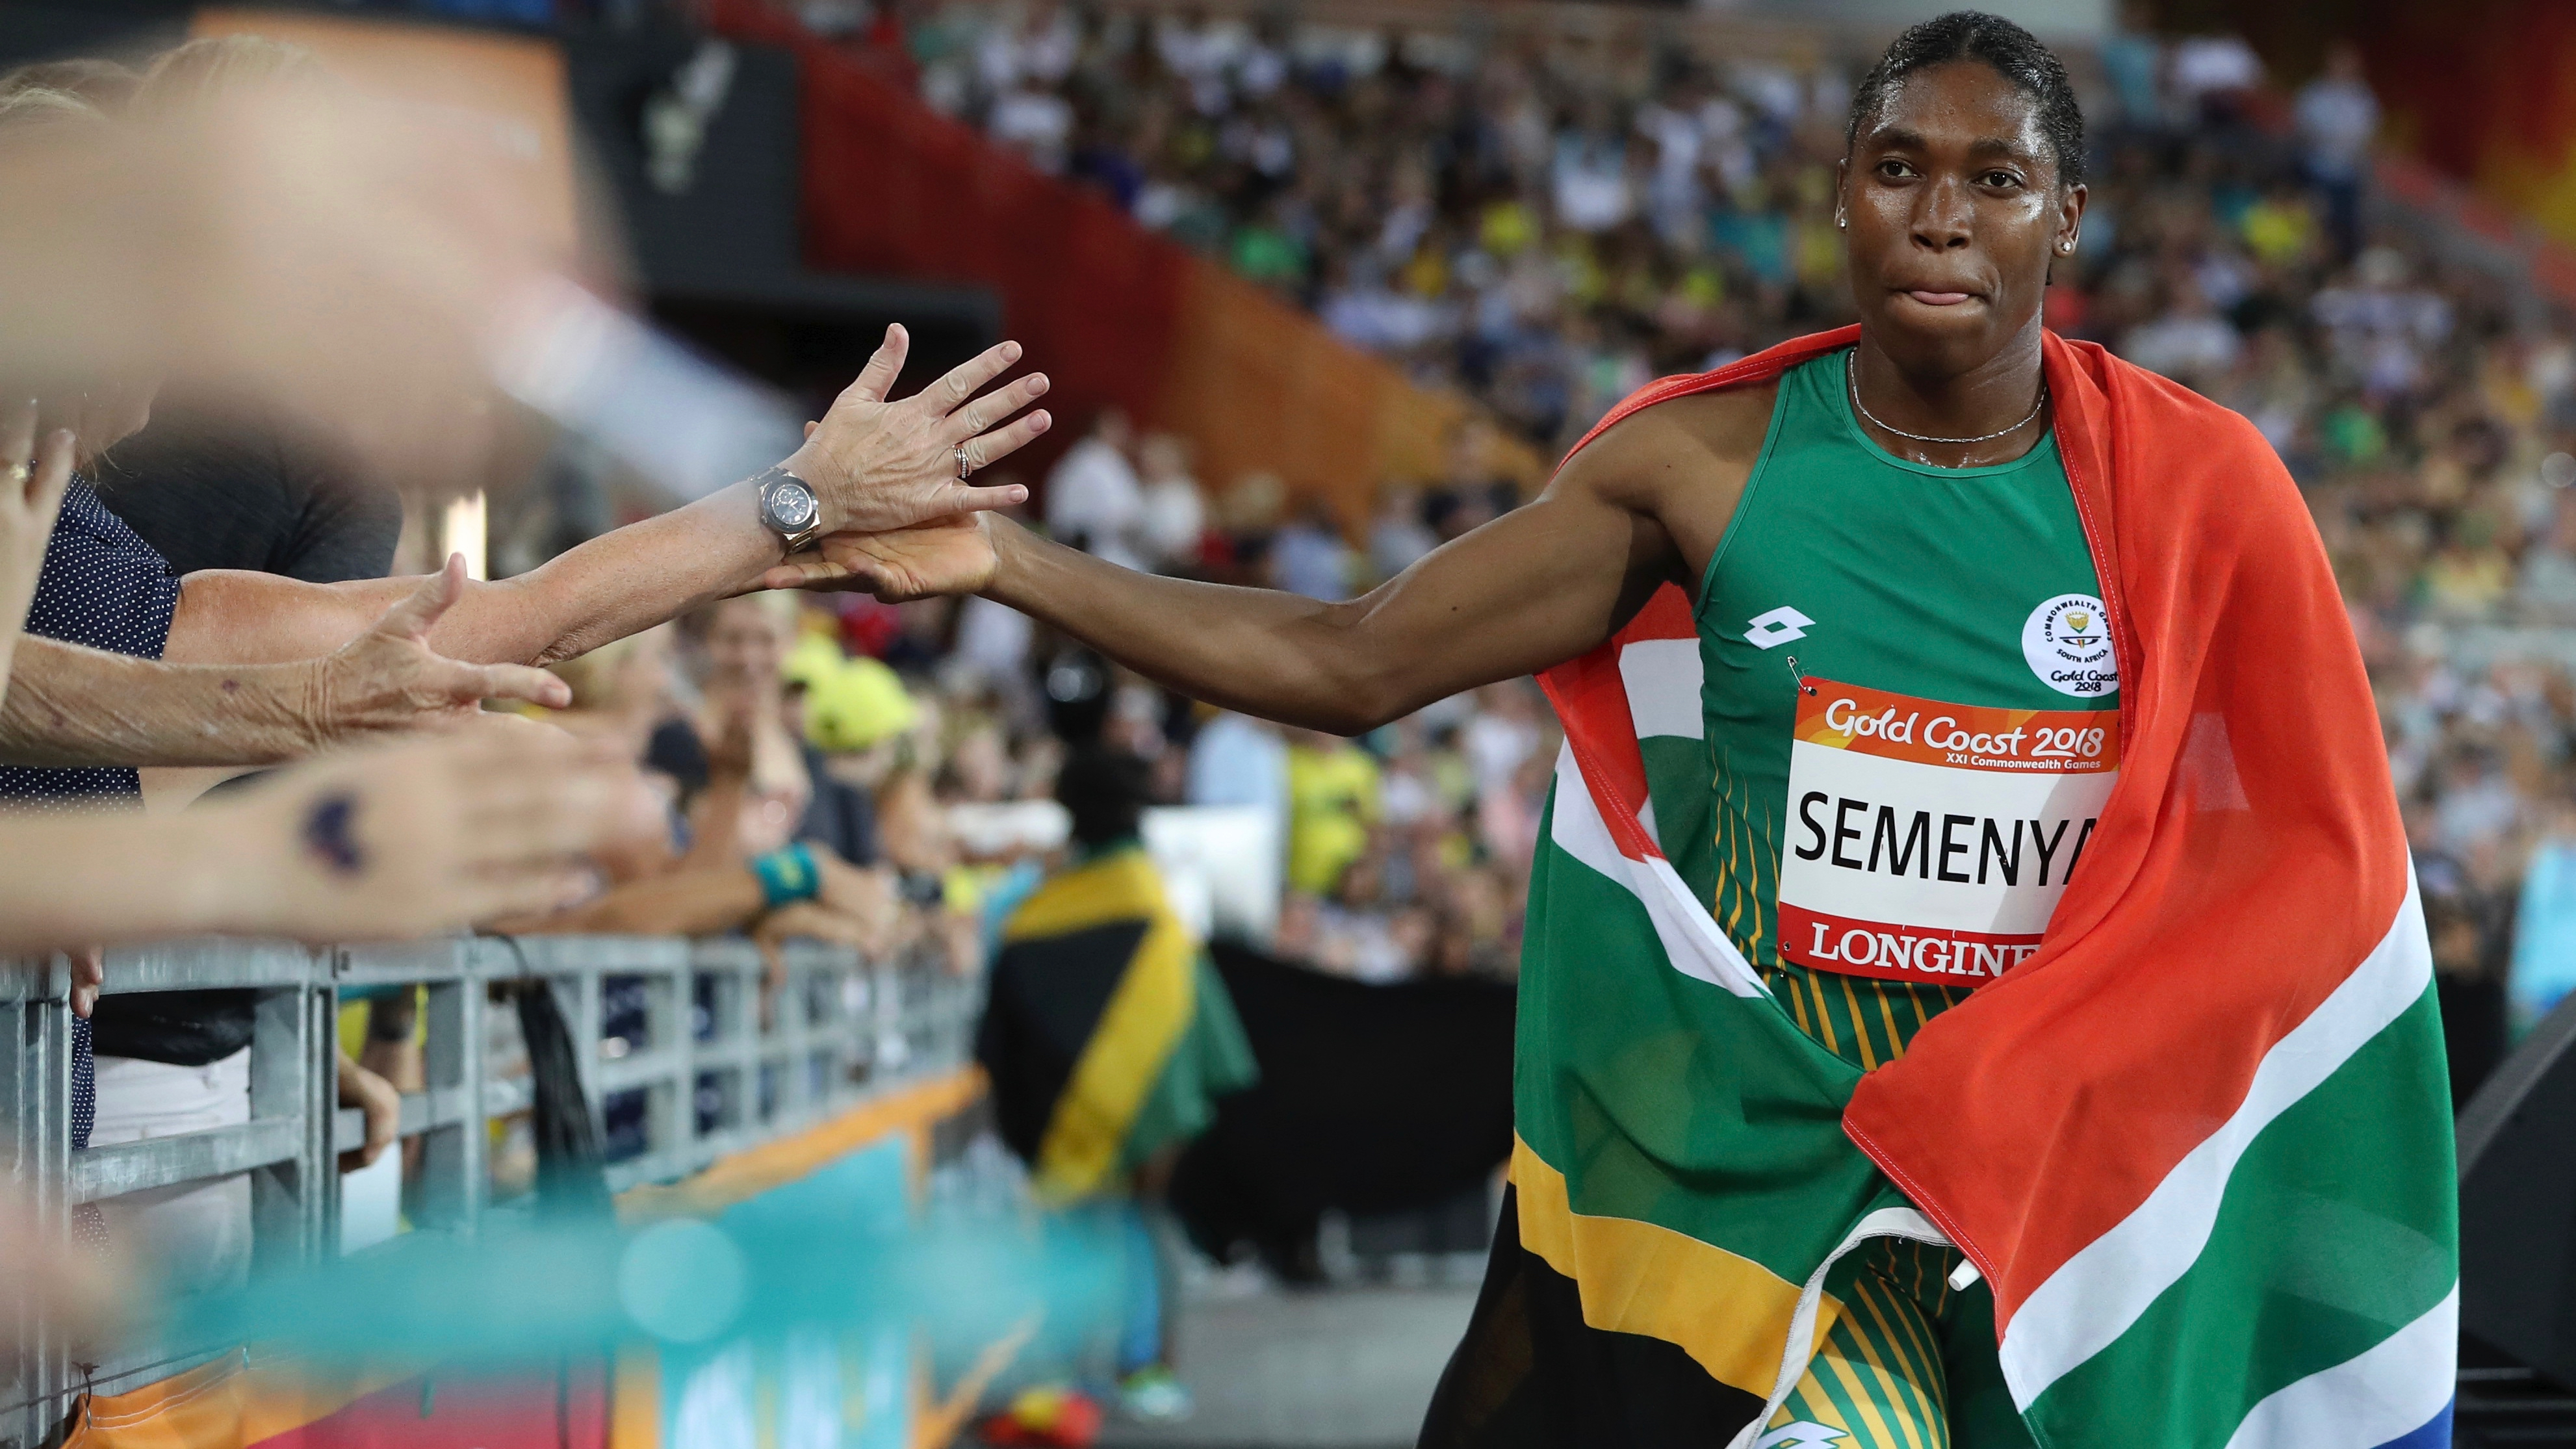 Caster Semenya challenges athletics federation's gender rules